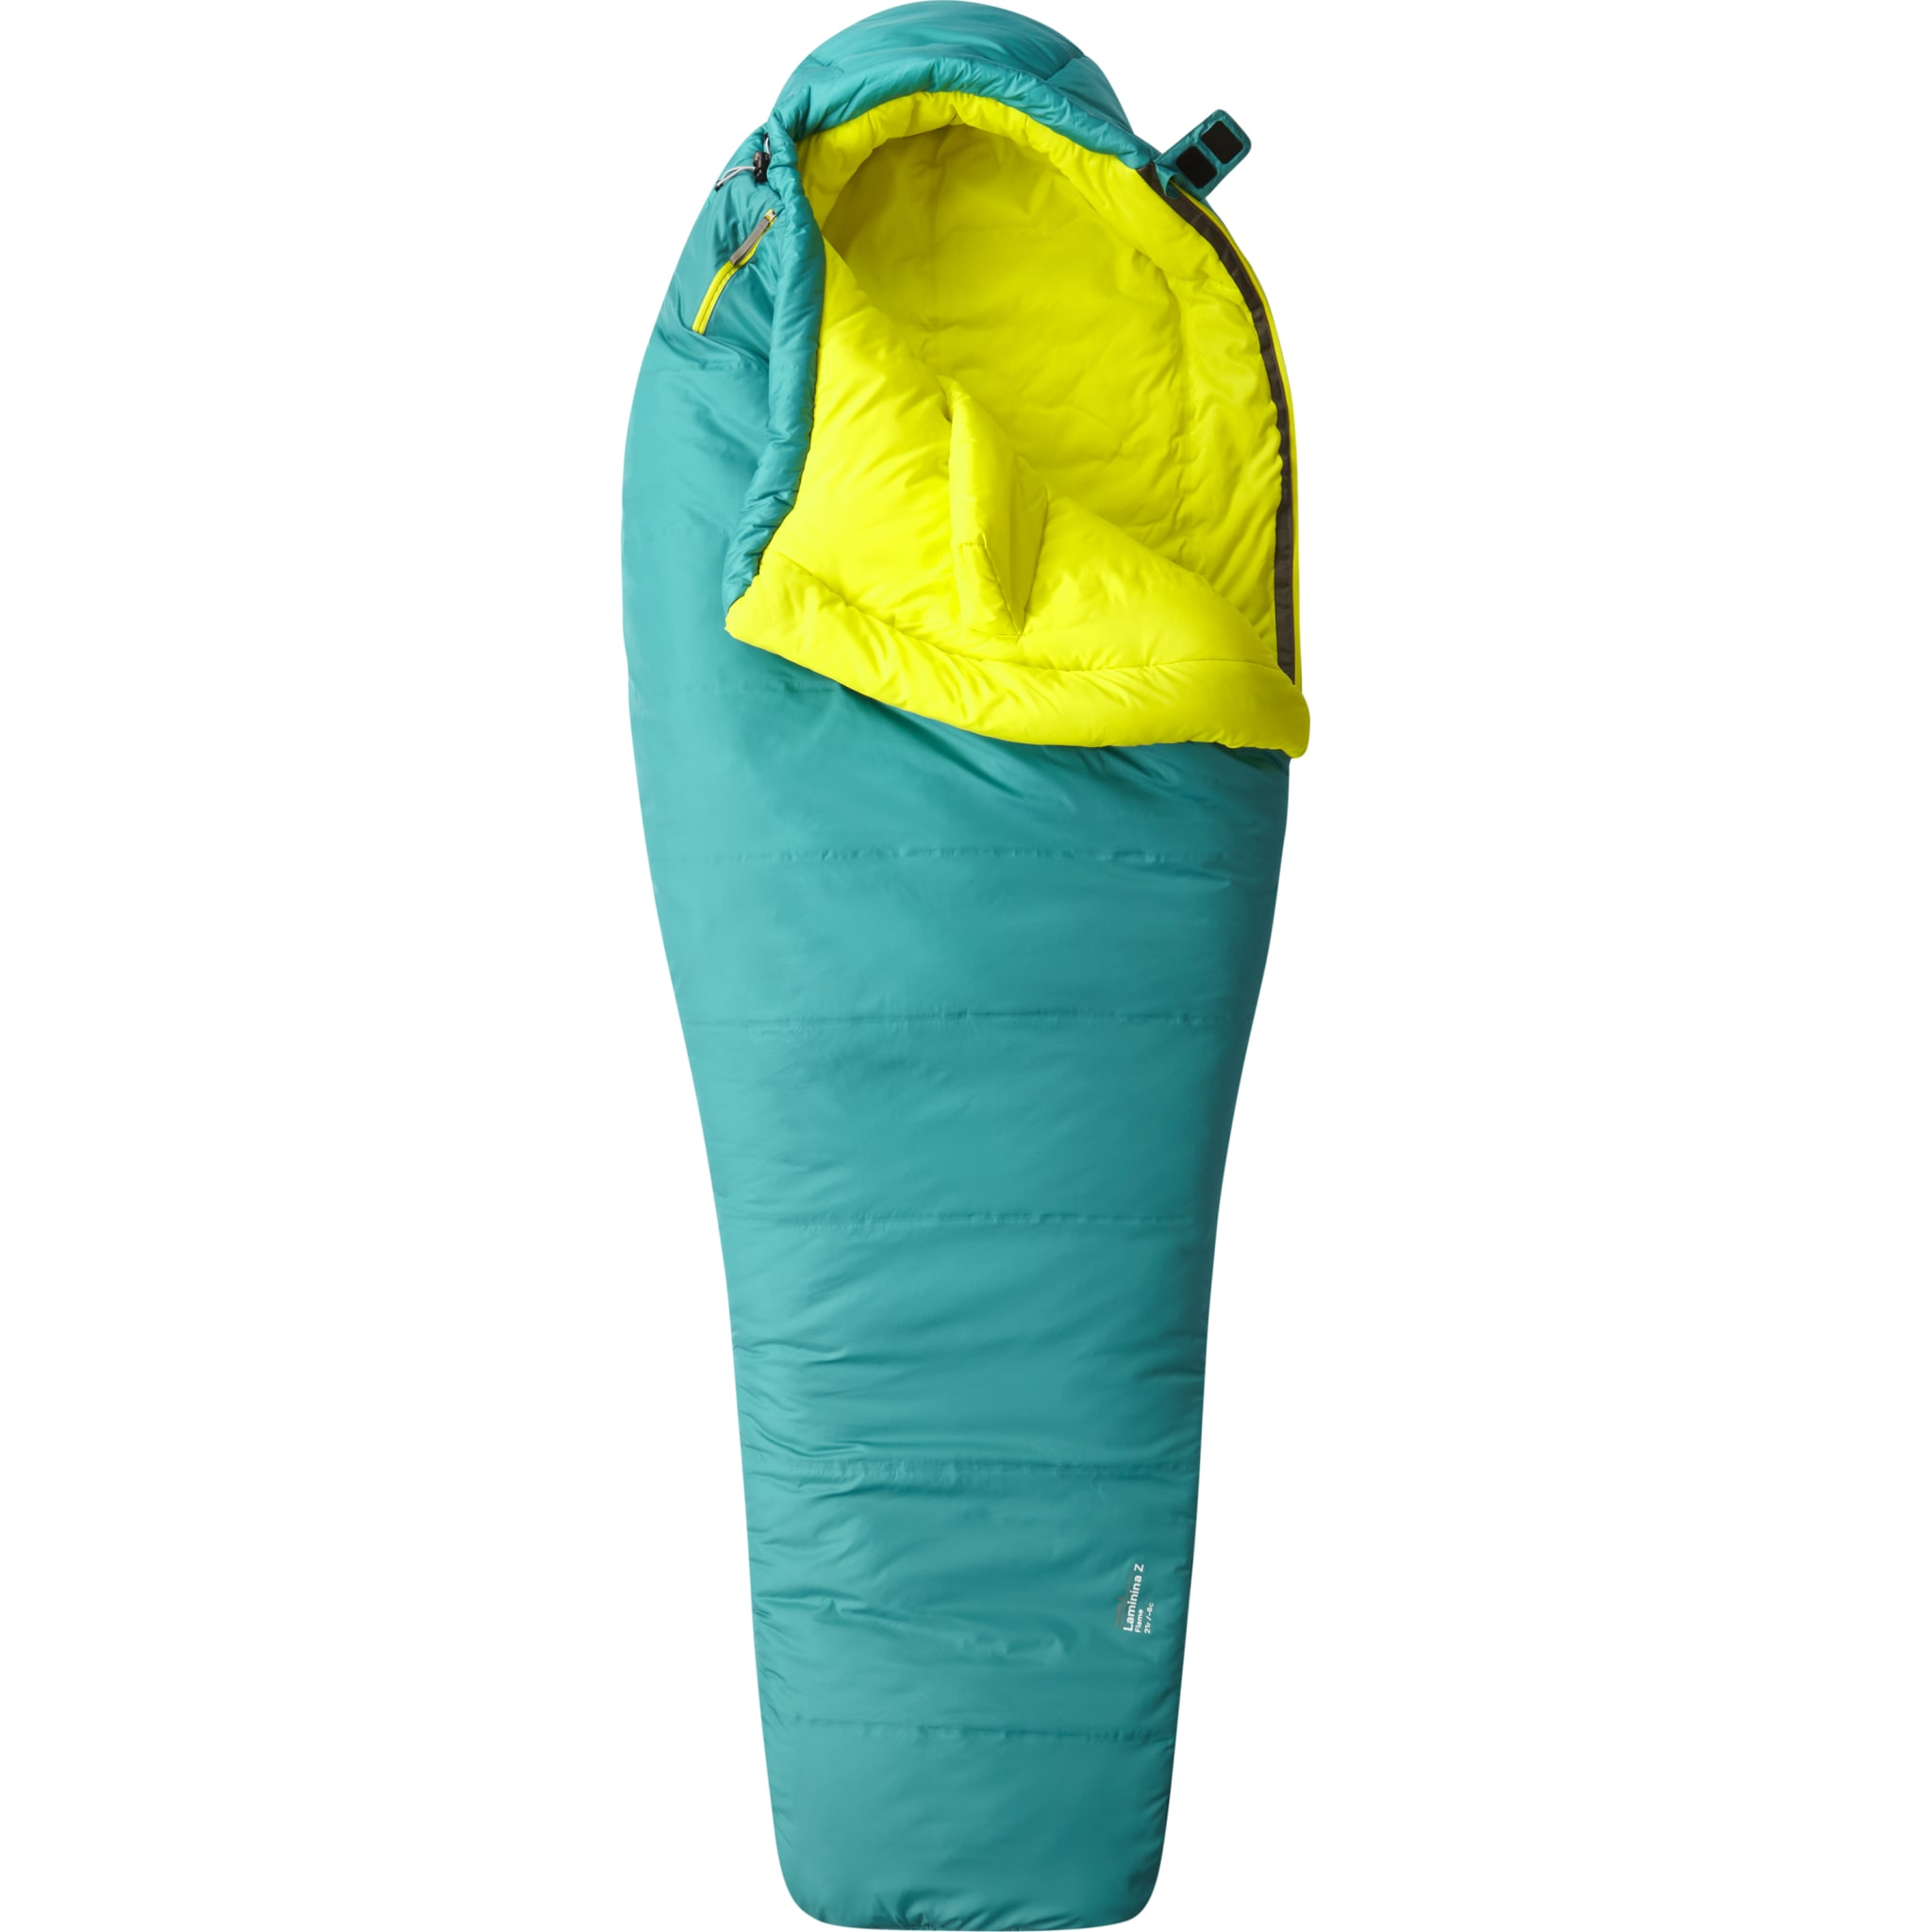 Prisgunstig sovepose for vår, sommer og høst til dame!